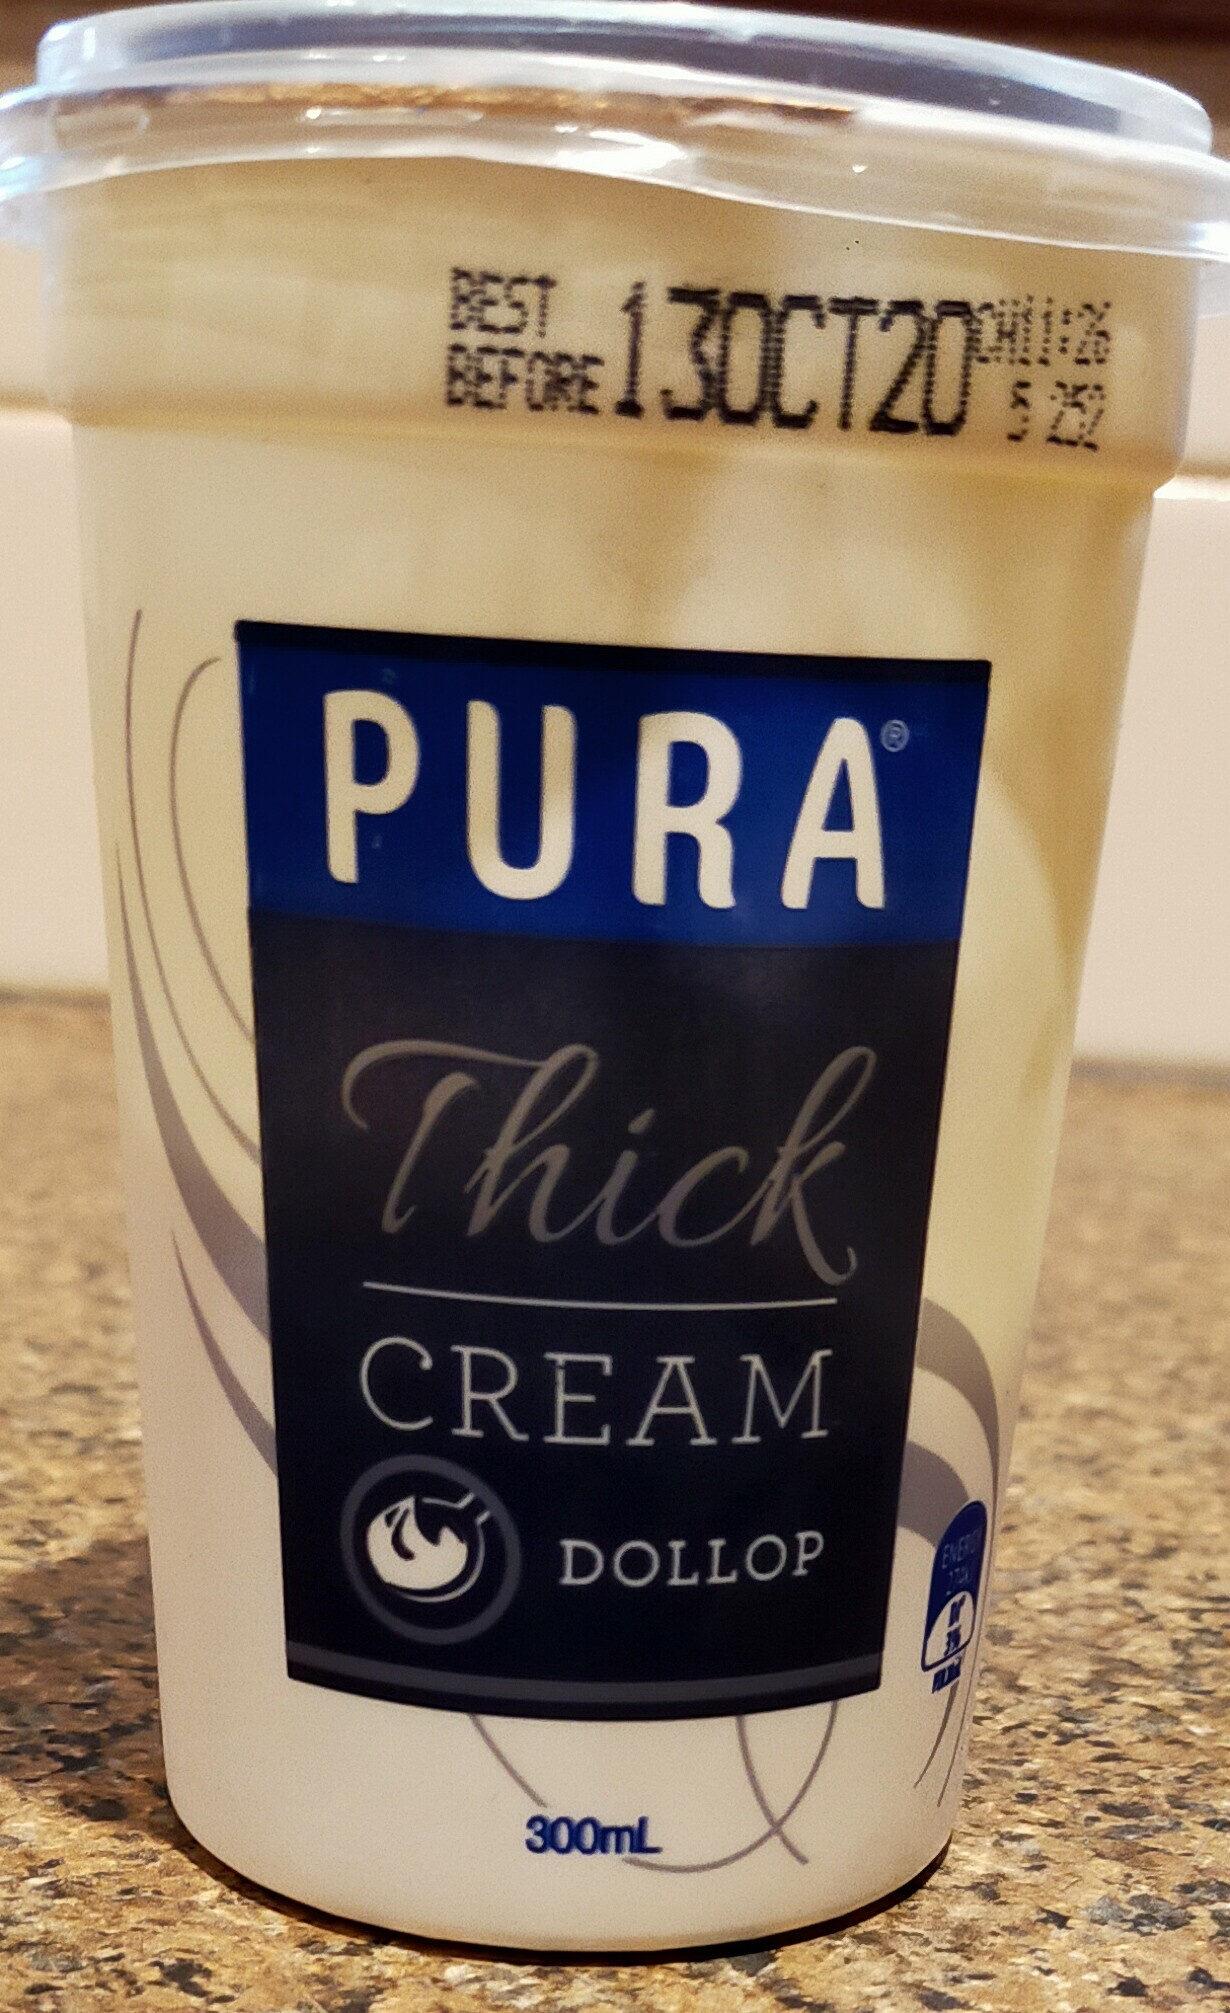 Thick Cream Dollop - Product - en